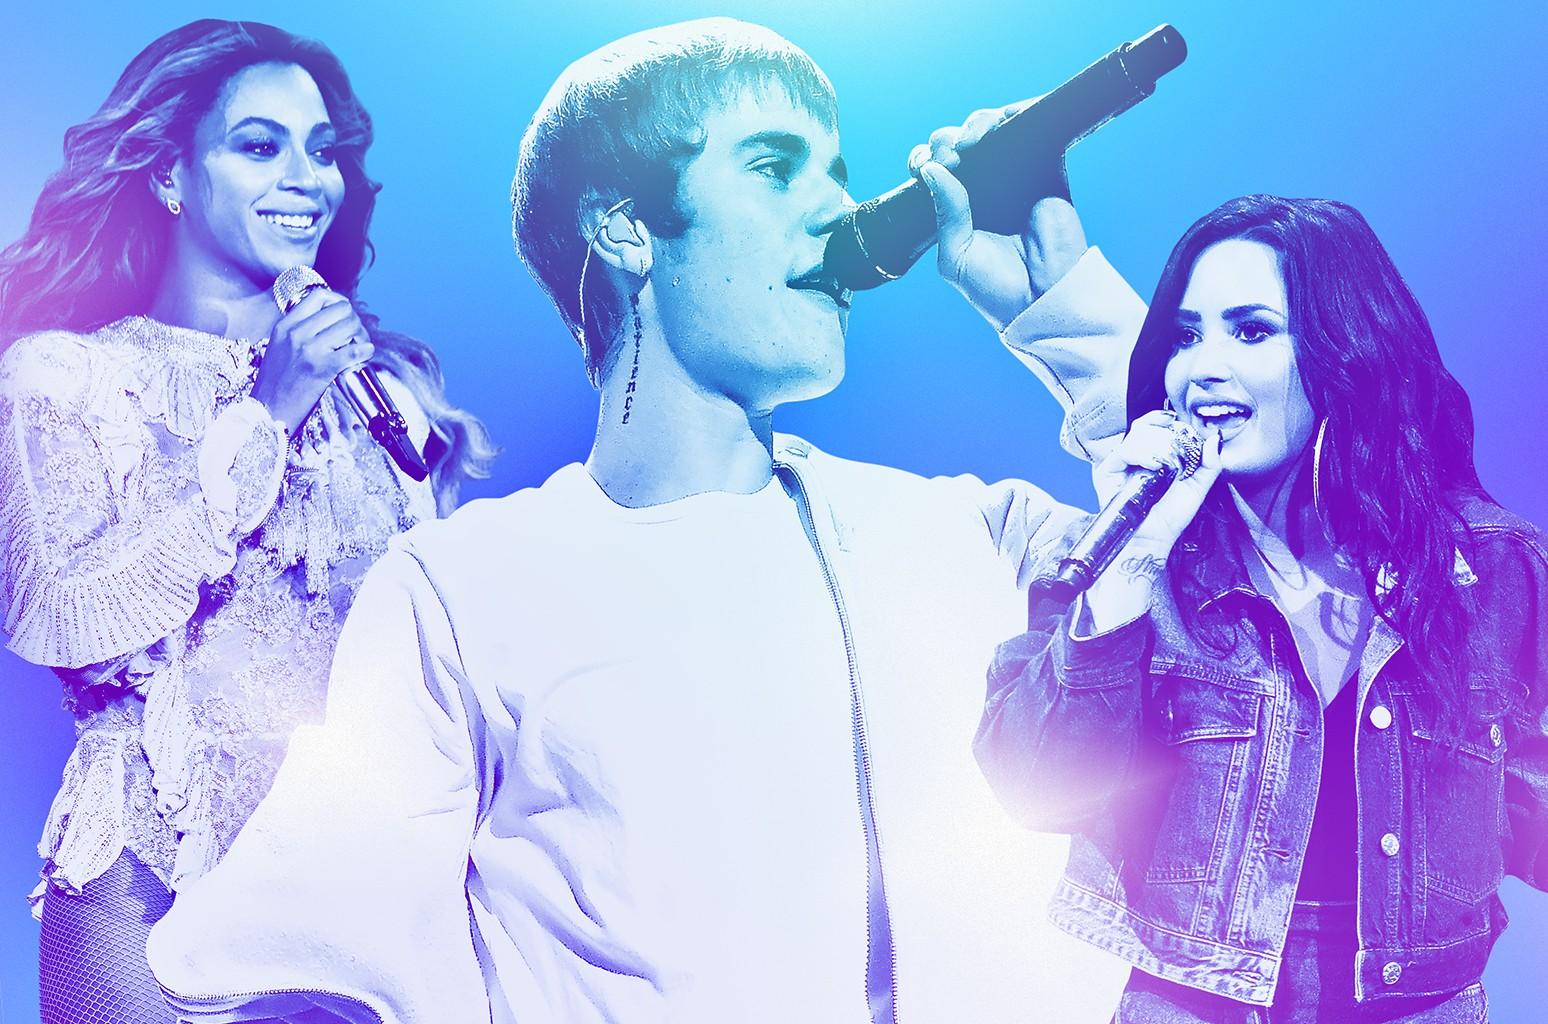 From left: Beyoncé, Justin Bieber & Demi Lovato